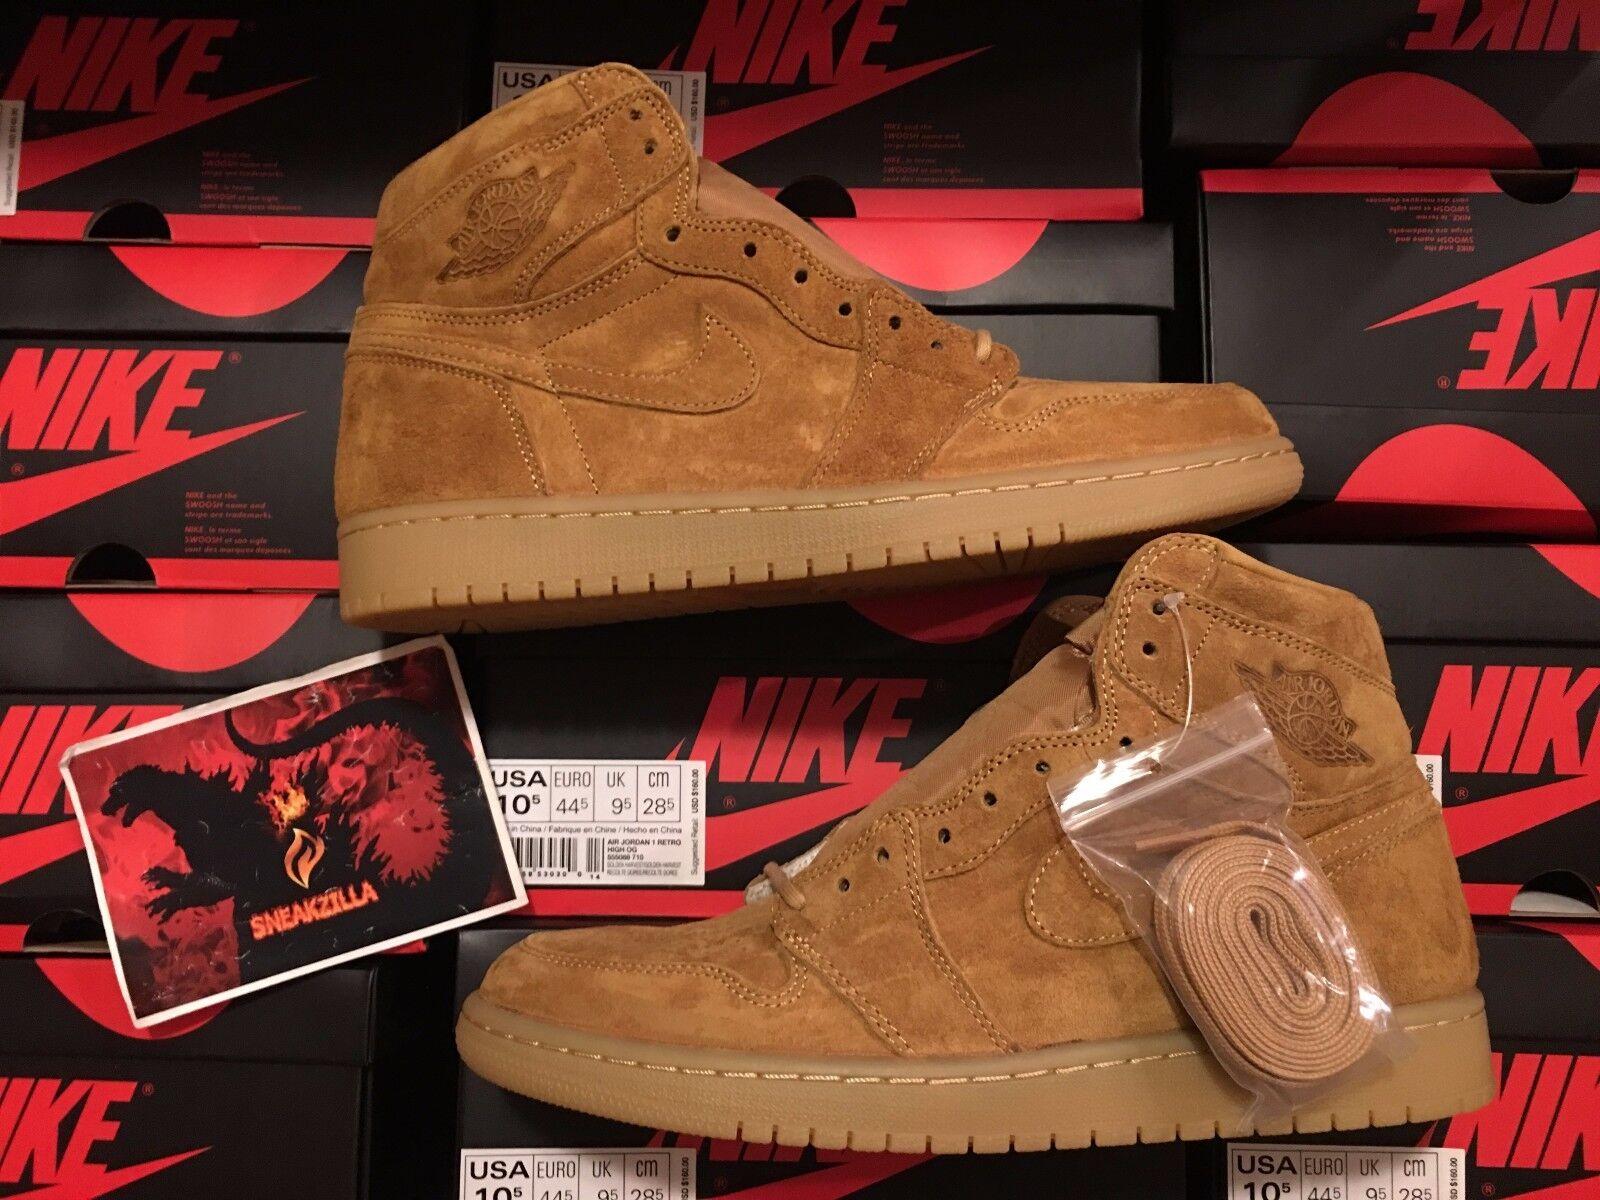 Nike Air Jordan Retro I 1 HIGH OG GOLDEN HARVEST Wheat Flax 555088-710 Sz 8-14